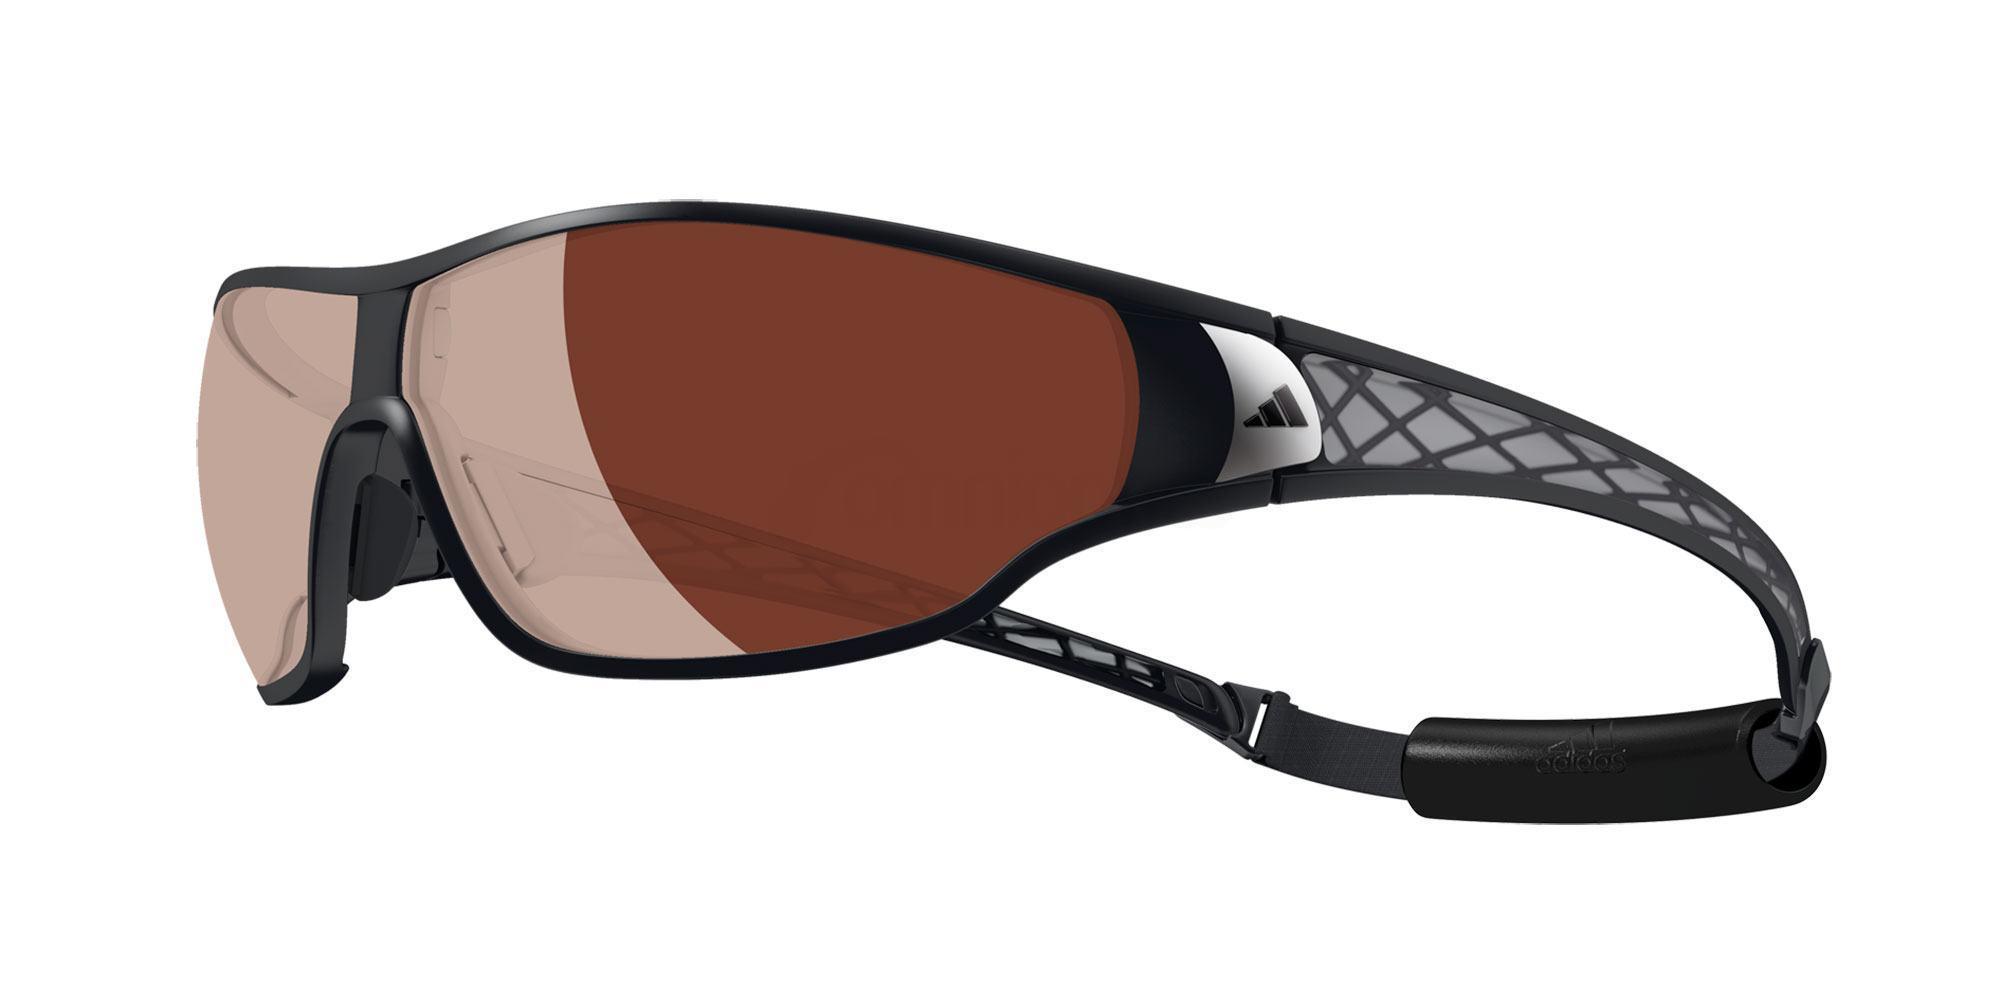 a190/00 6050 a190 Tycane Pro Polarized Sunglasses, Adidas